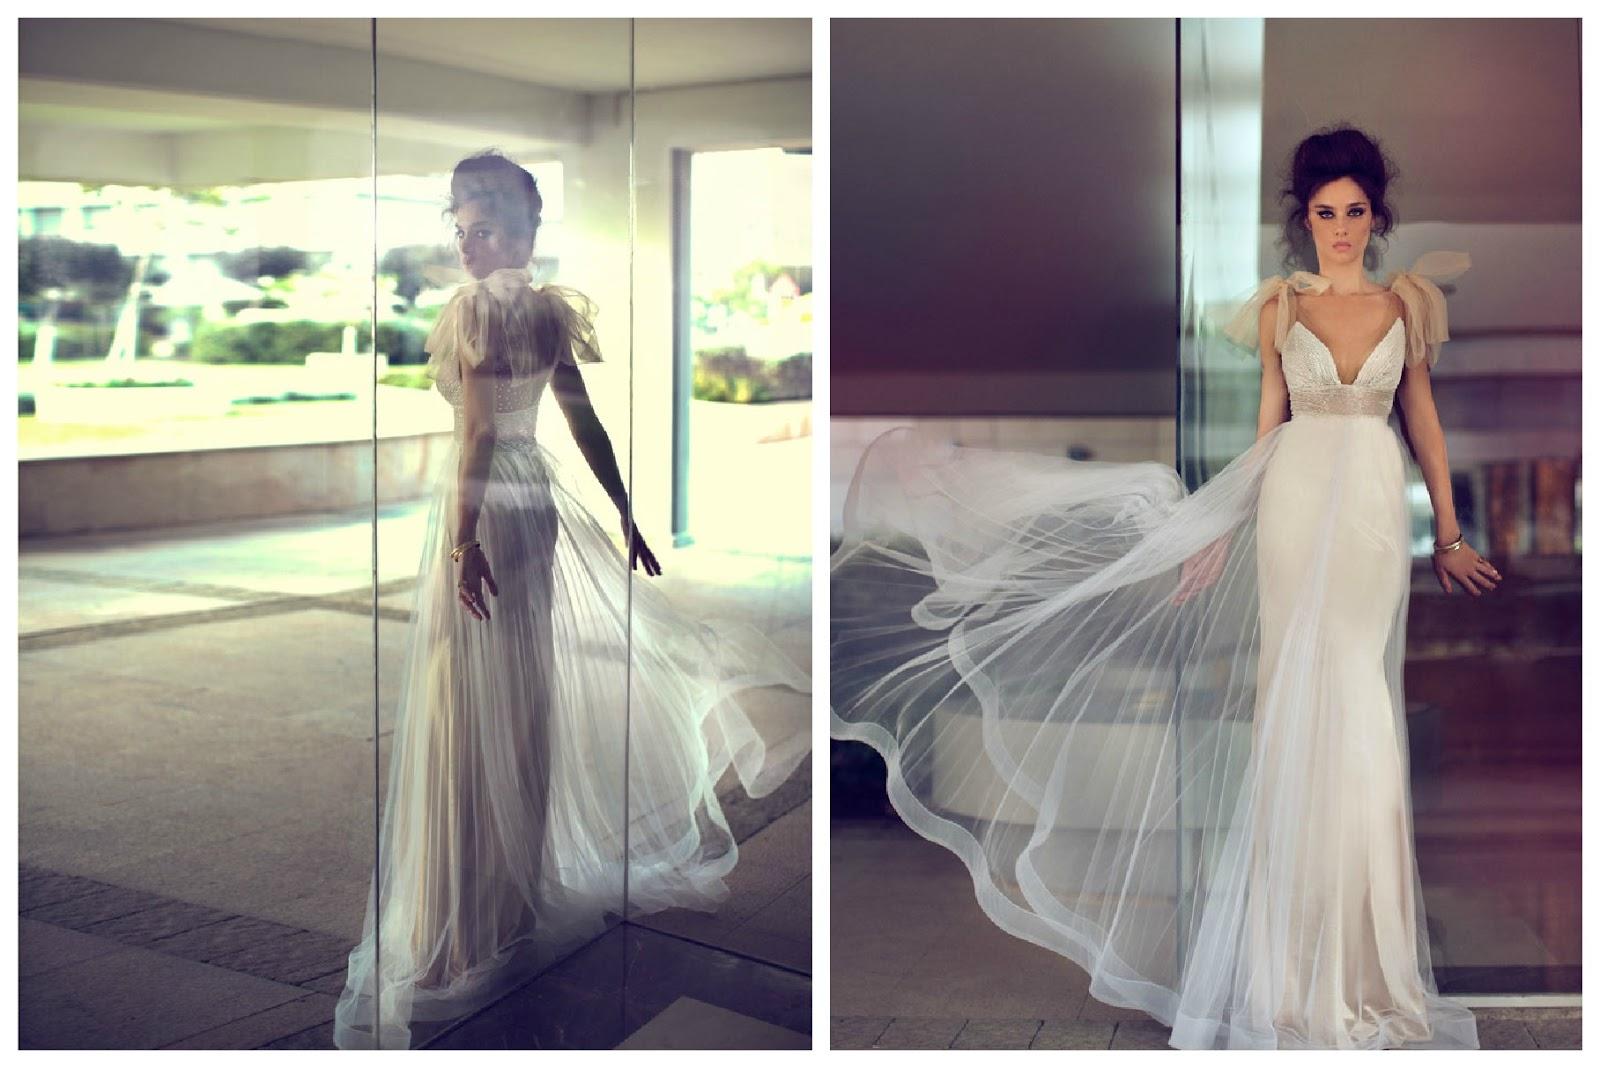 Wedding Dress 2nd Hand 93 Stunning P uP Gets Married